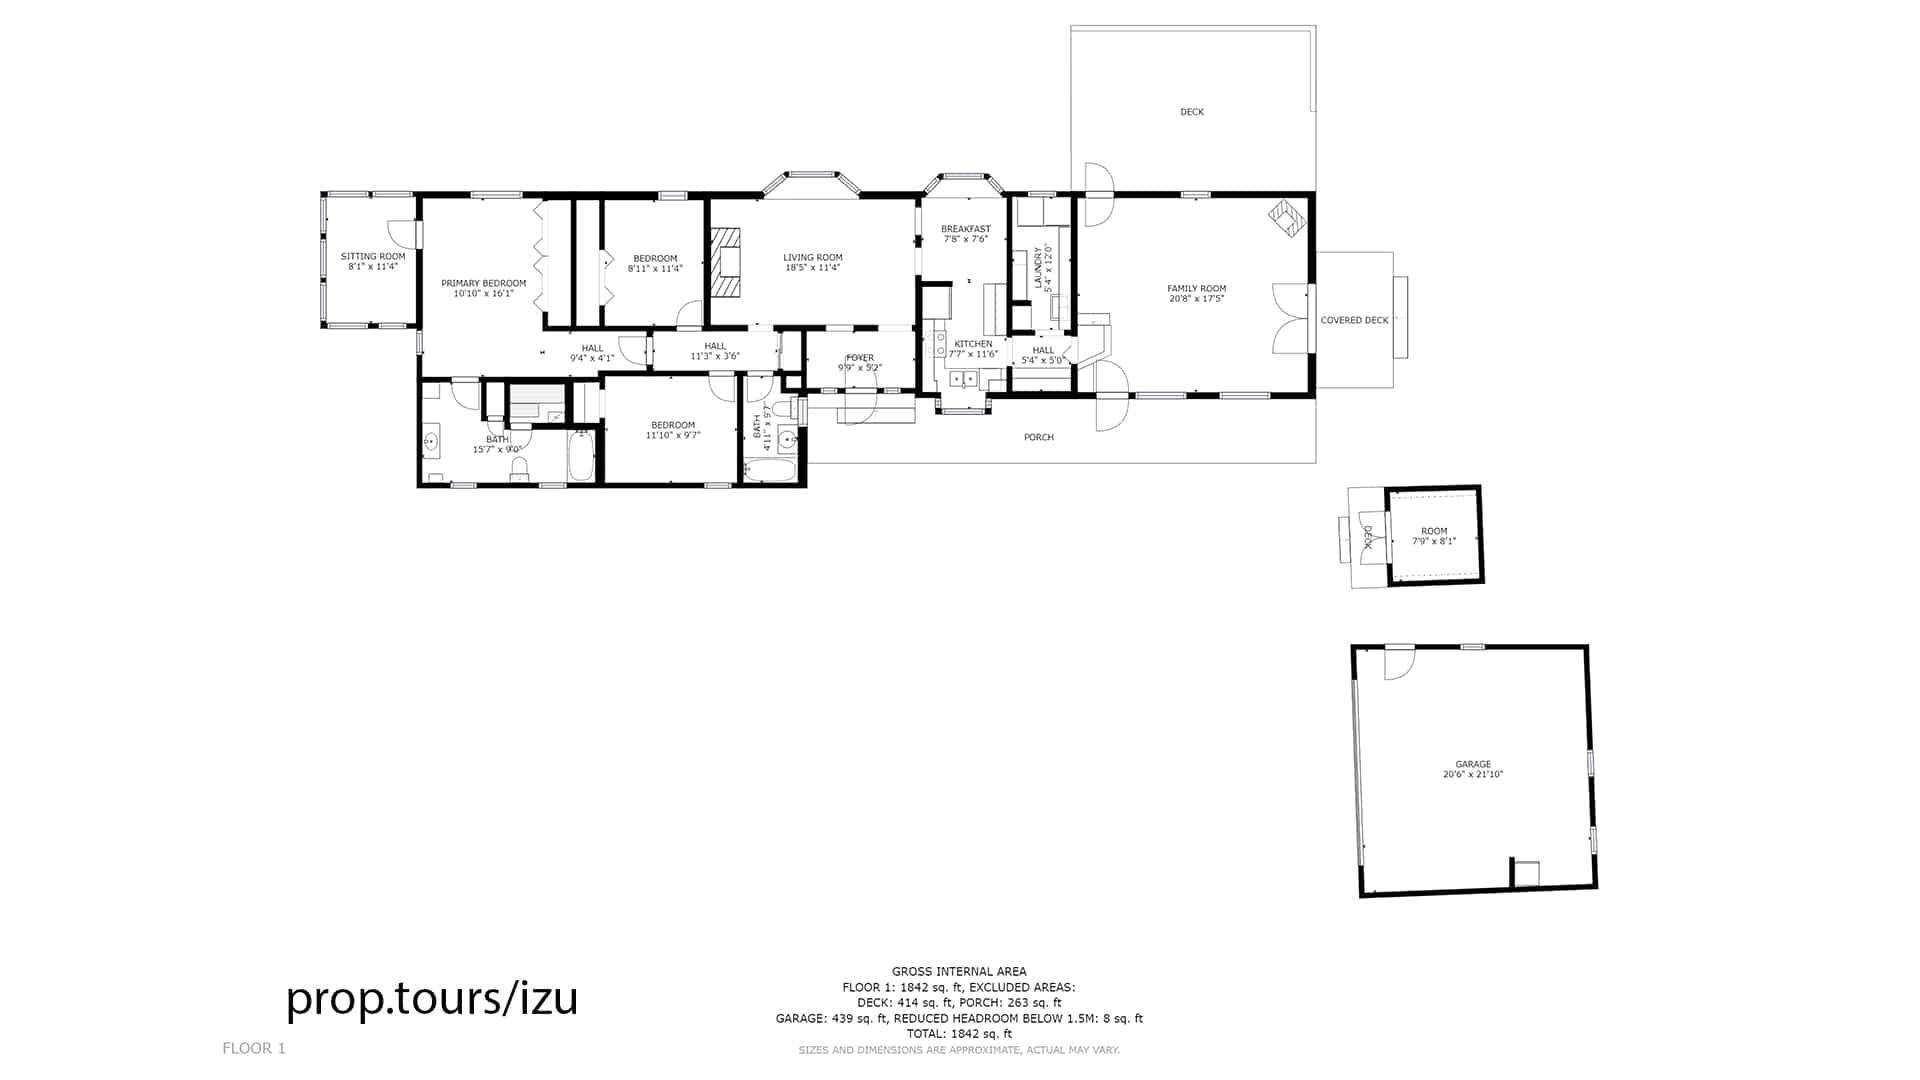 Evergreen home for sale floor plan